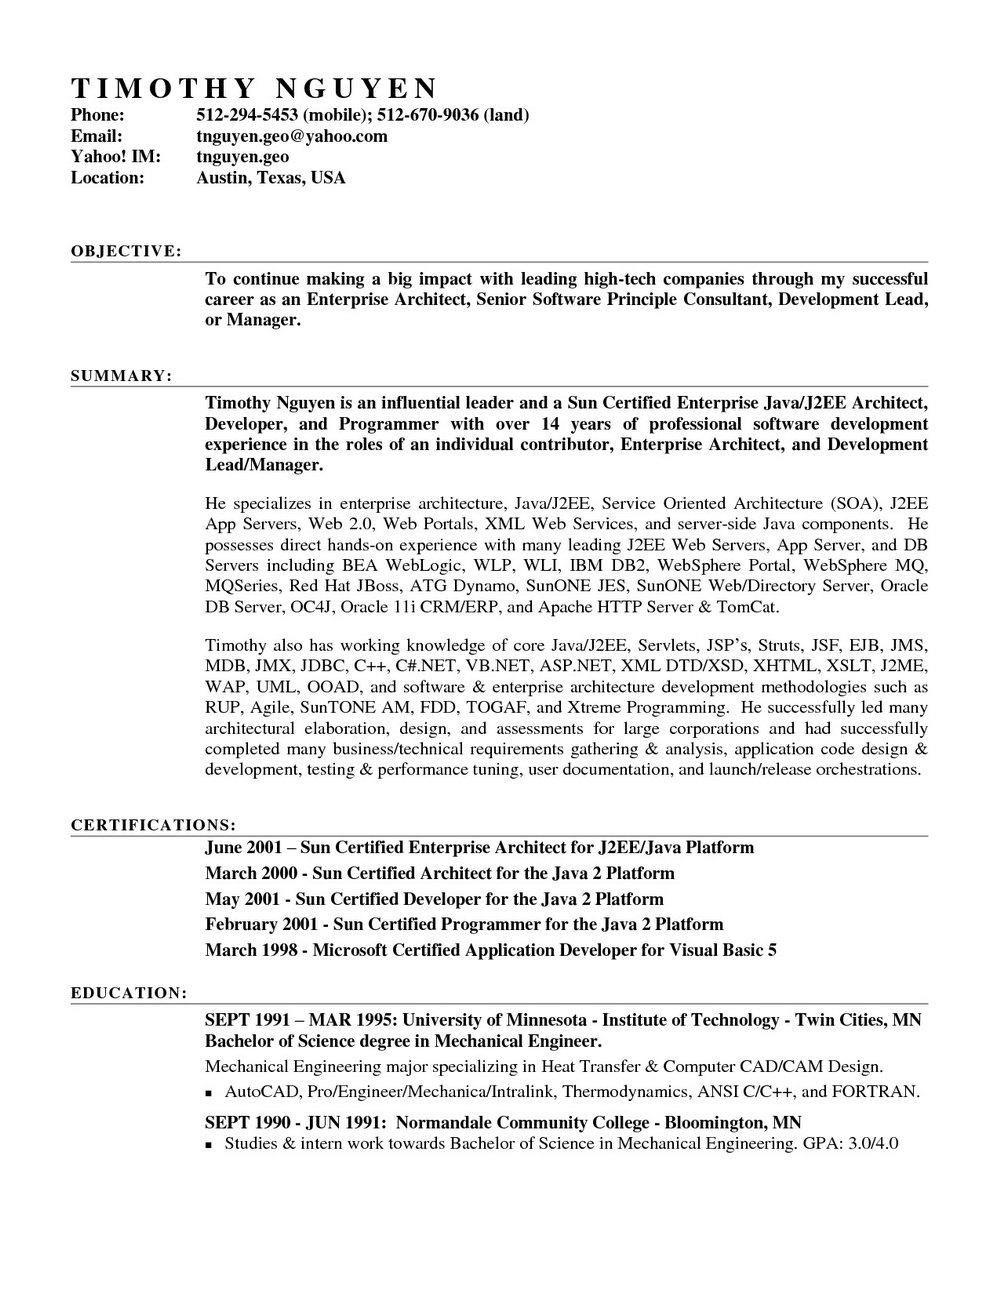 Microsoft Word Resume Templates Free Resume Template 18 Debra Wi